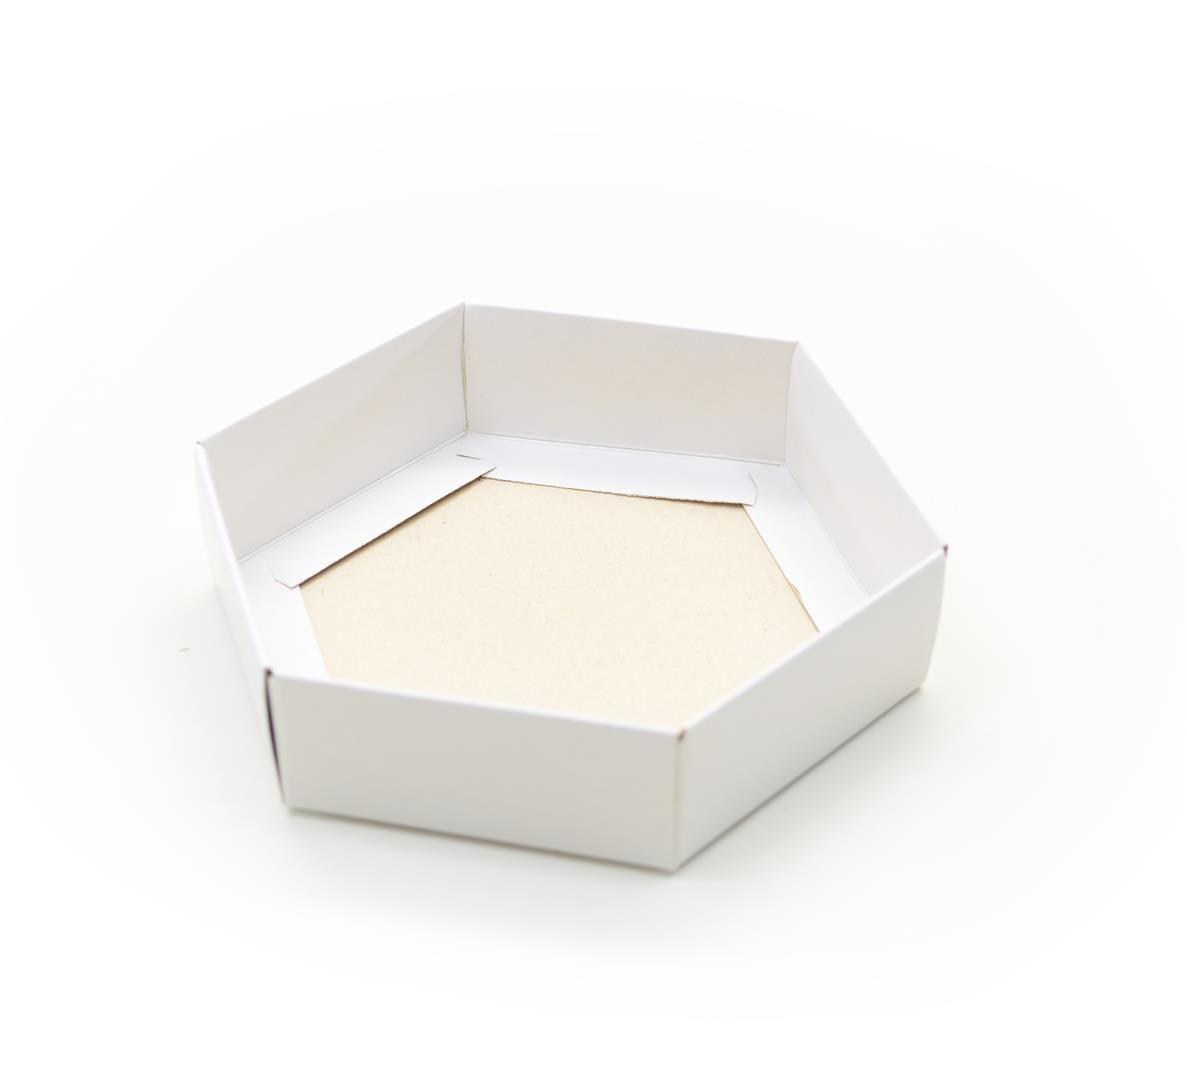 F027 - Fundo - 6,5x3 cm